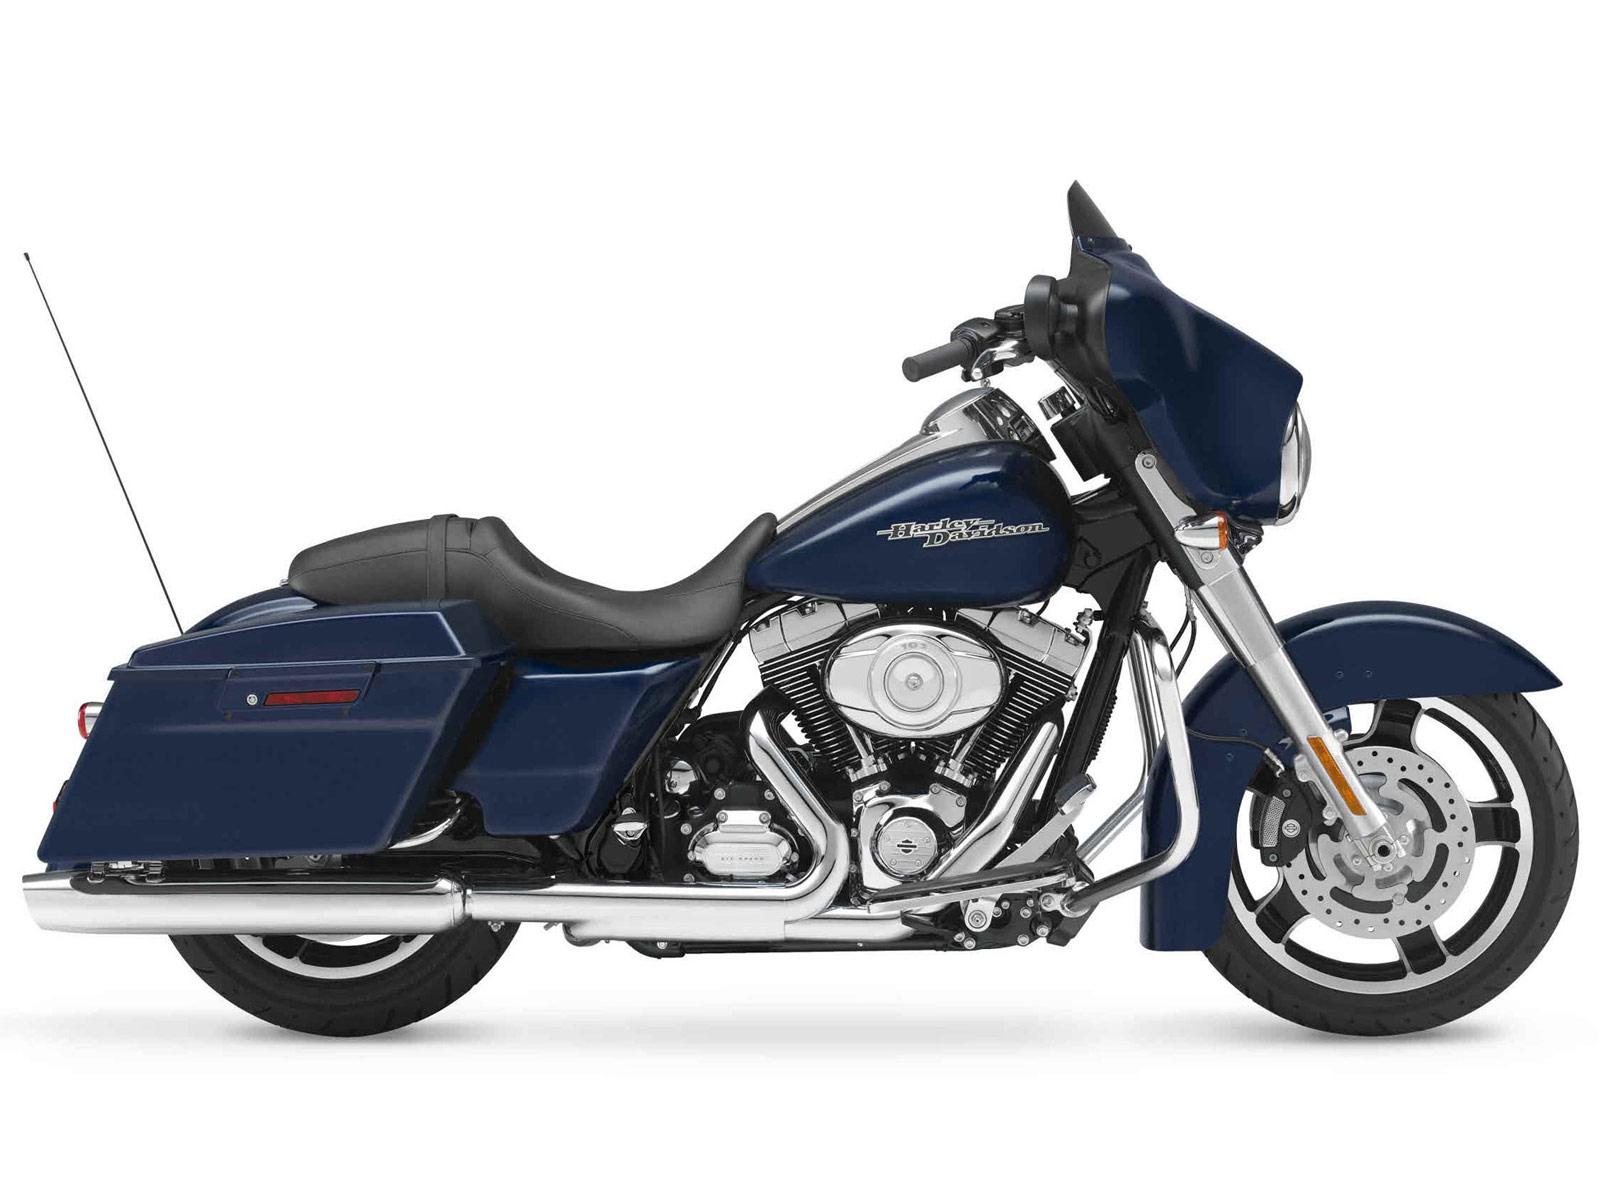 Harley Davidson Flhx Street Glide Review